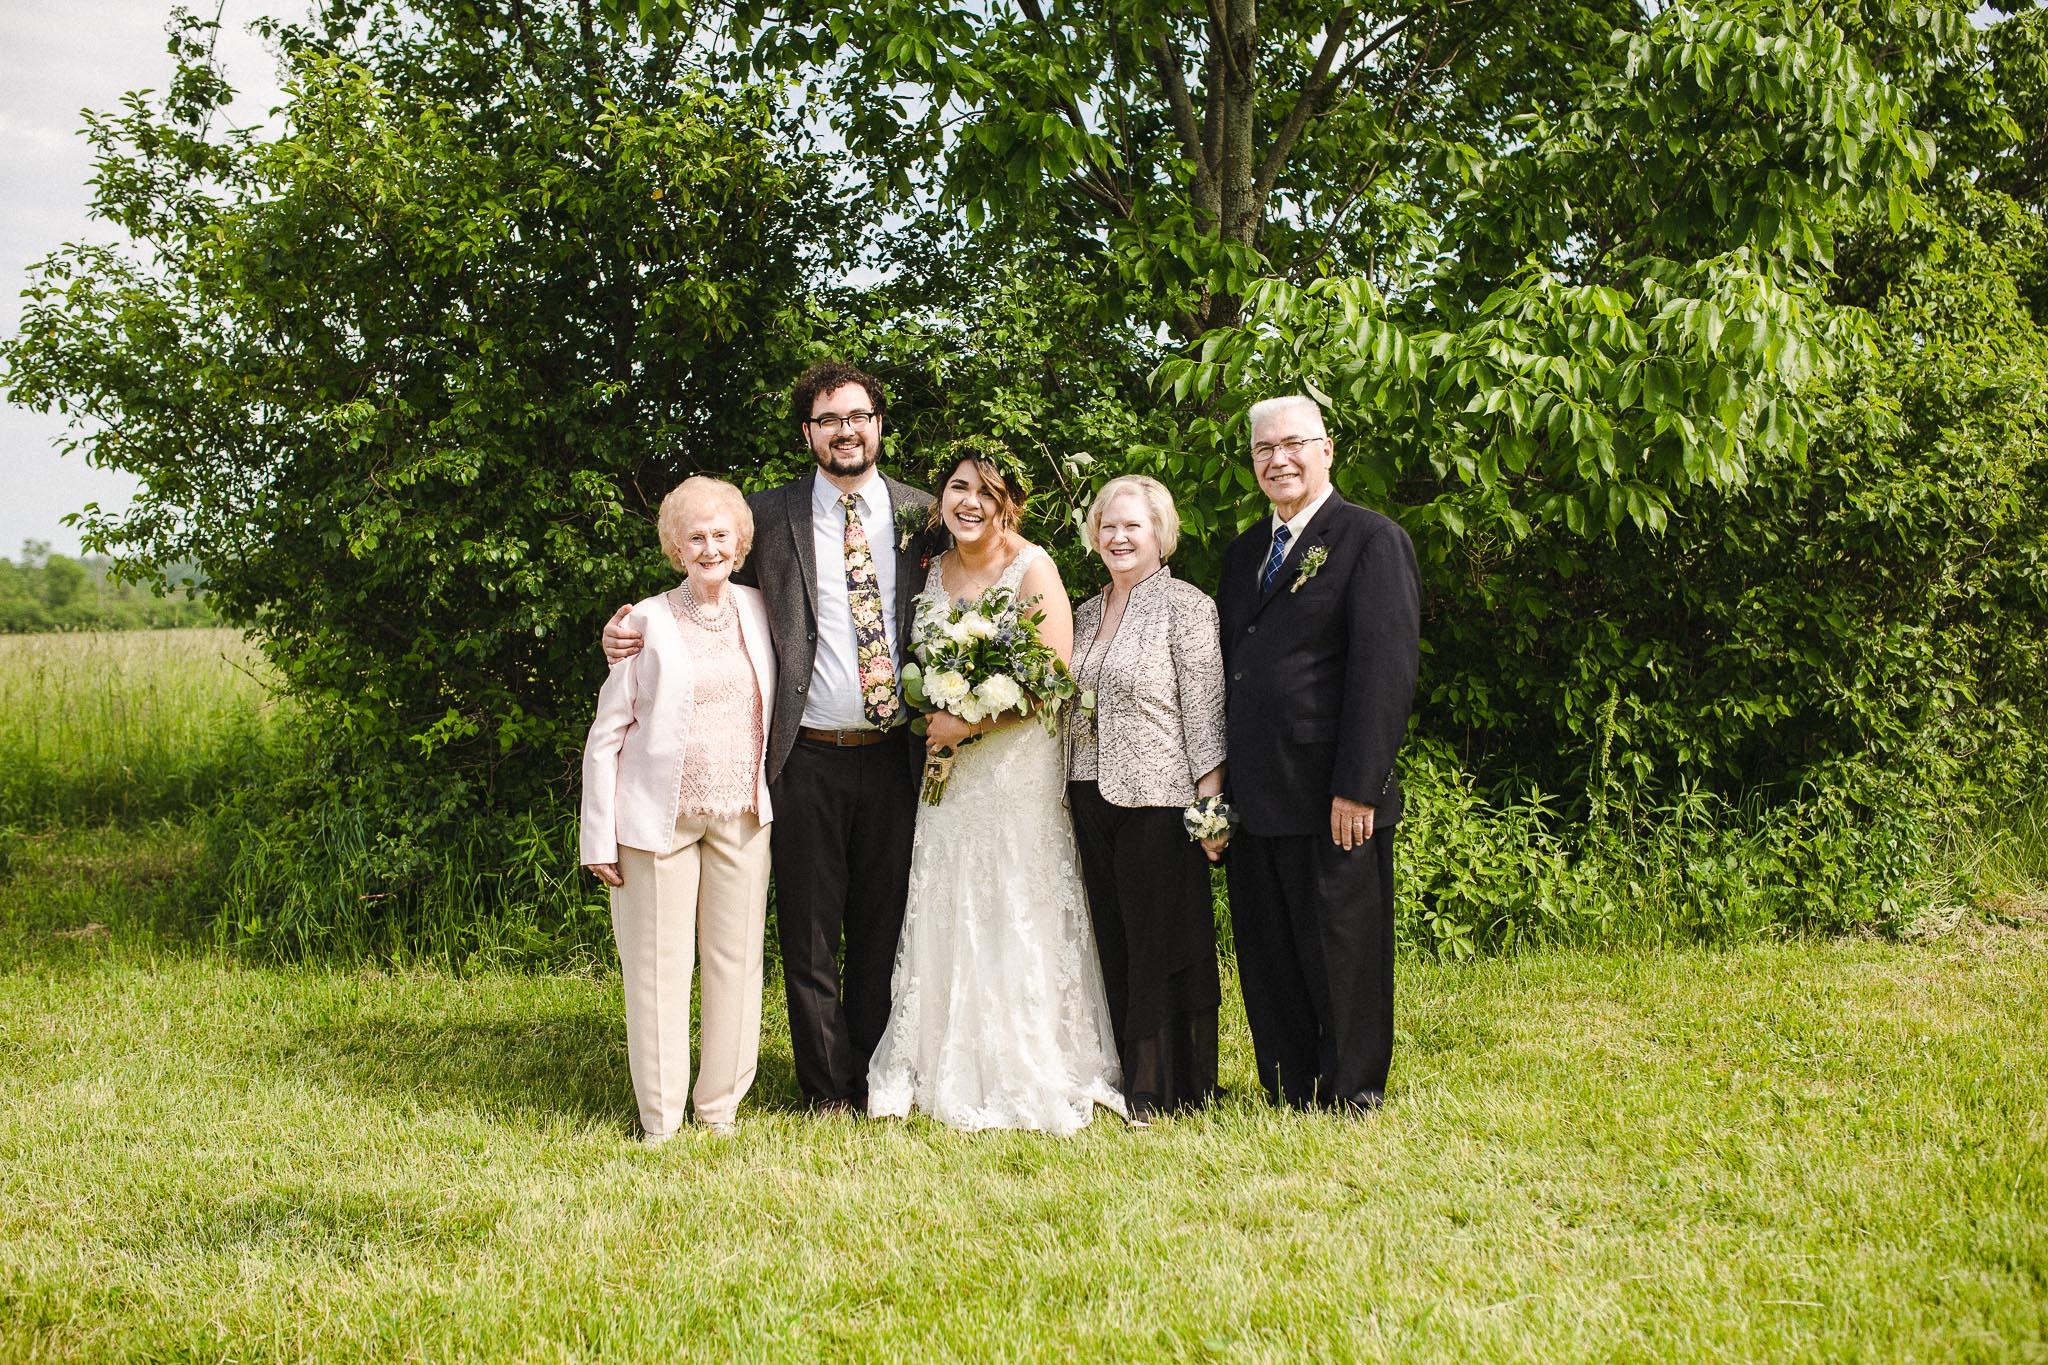 Orlando-Wedding-Photographer (14 of 89).JPG